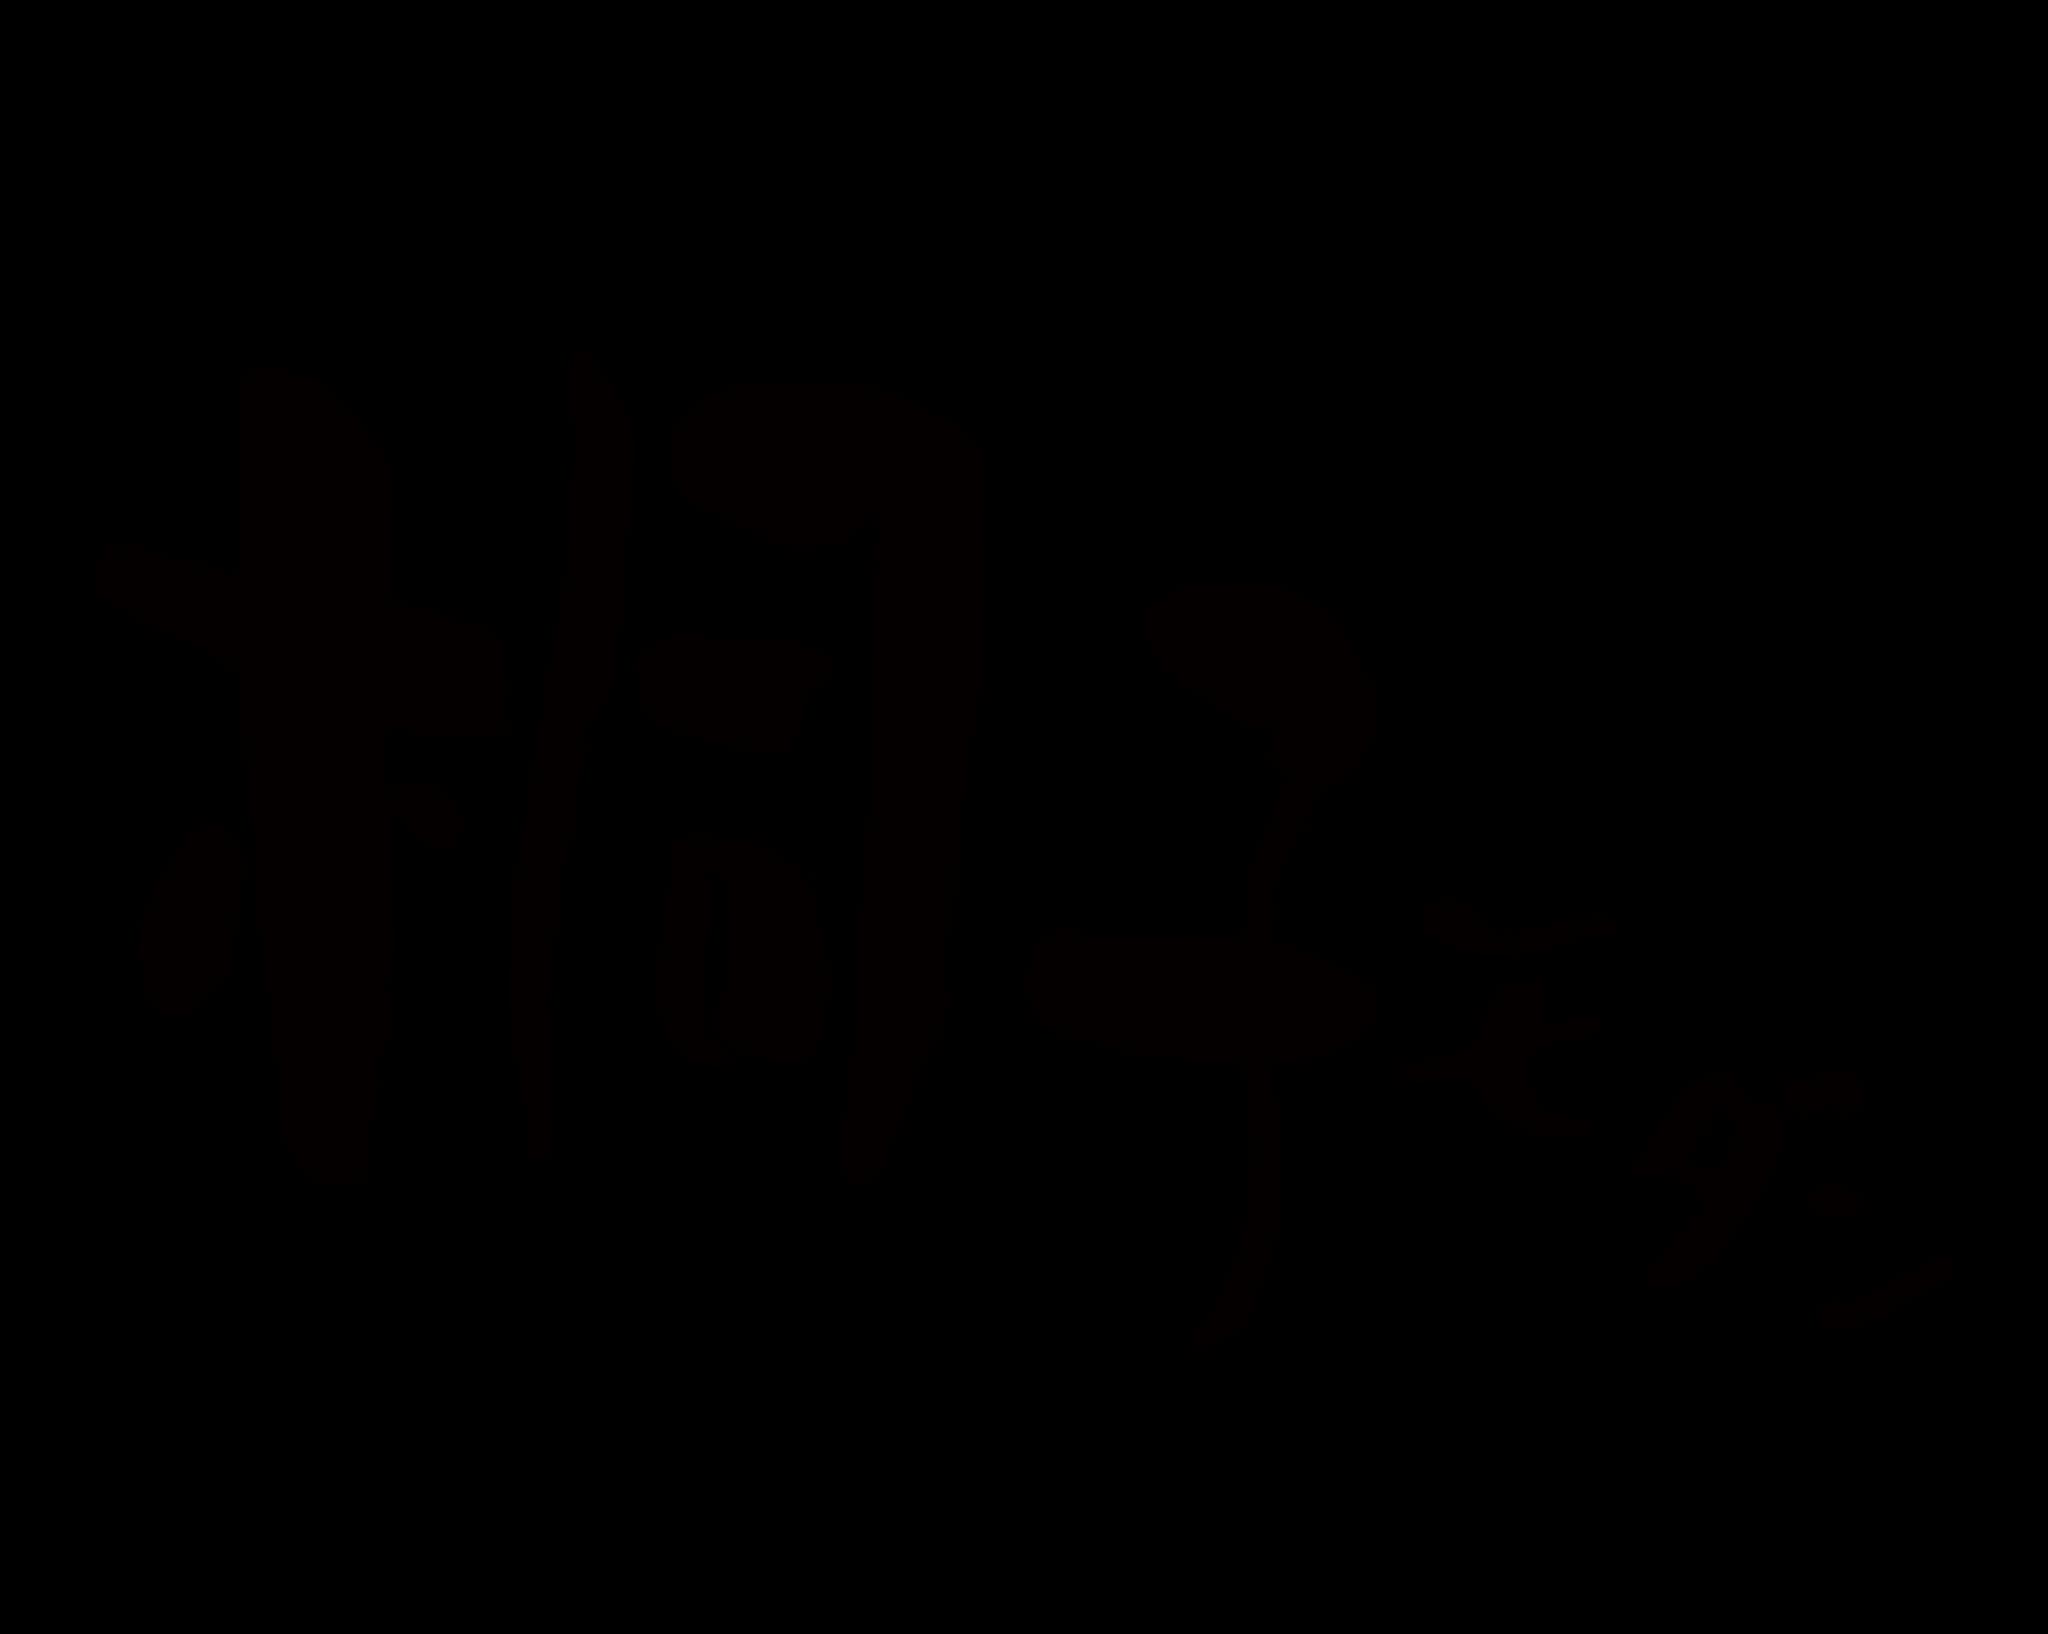 KIRIKO ONLINE SHOP